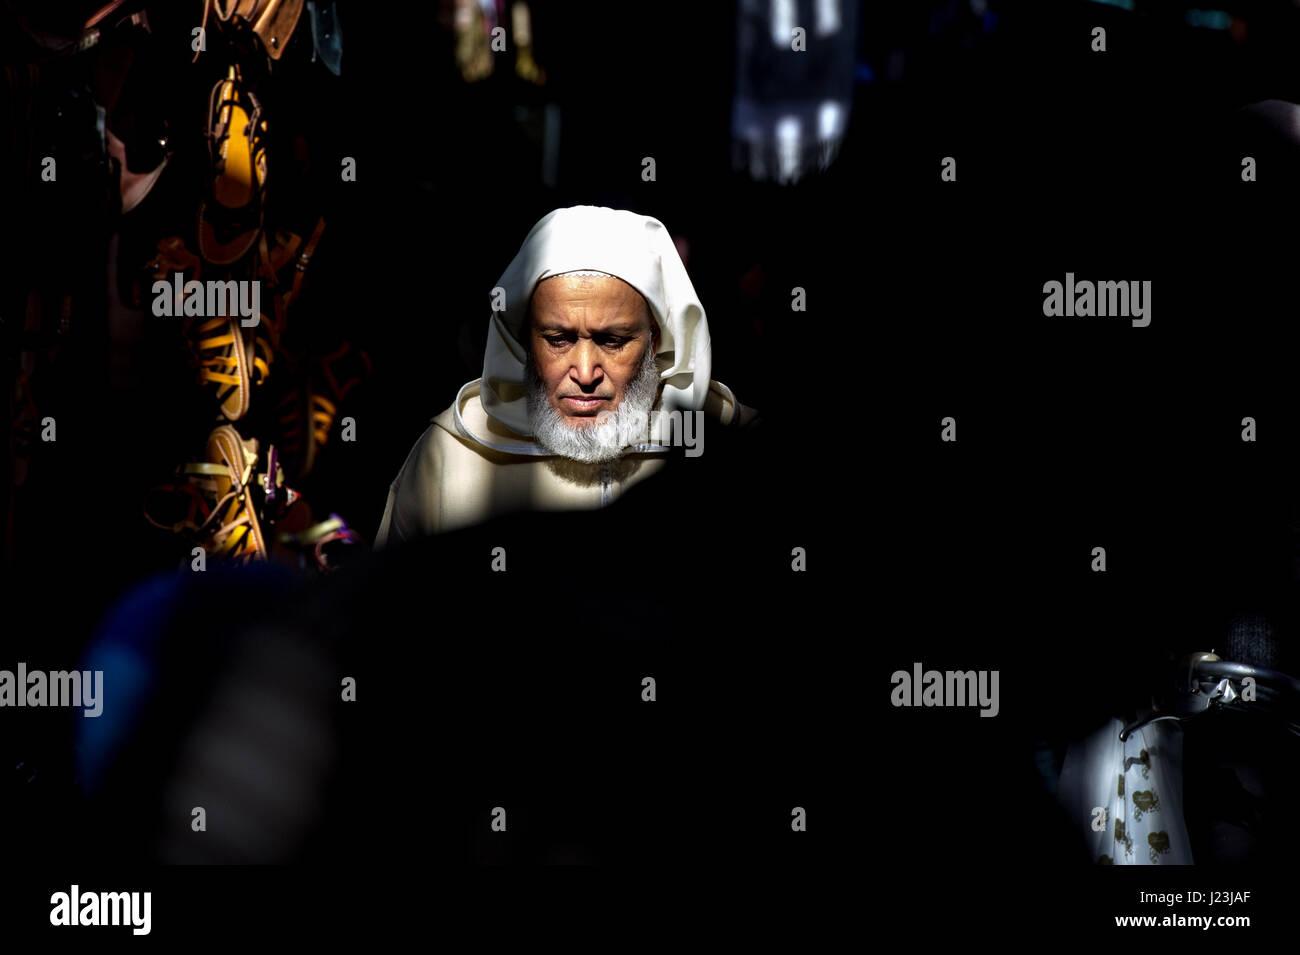 North Africa, Morocco, Marrakech, Portrait of a elderly man, Marrakesh, Morocco. - Stock Image